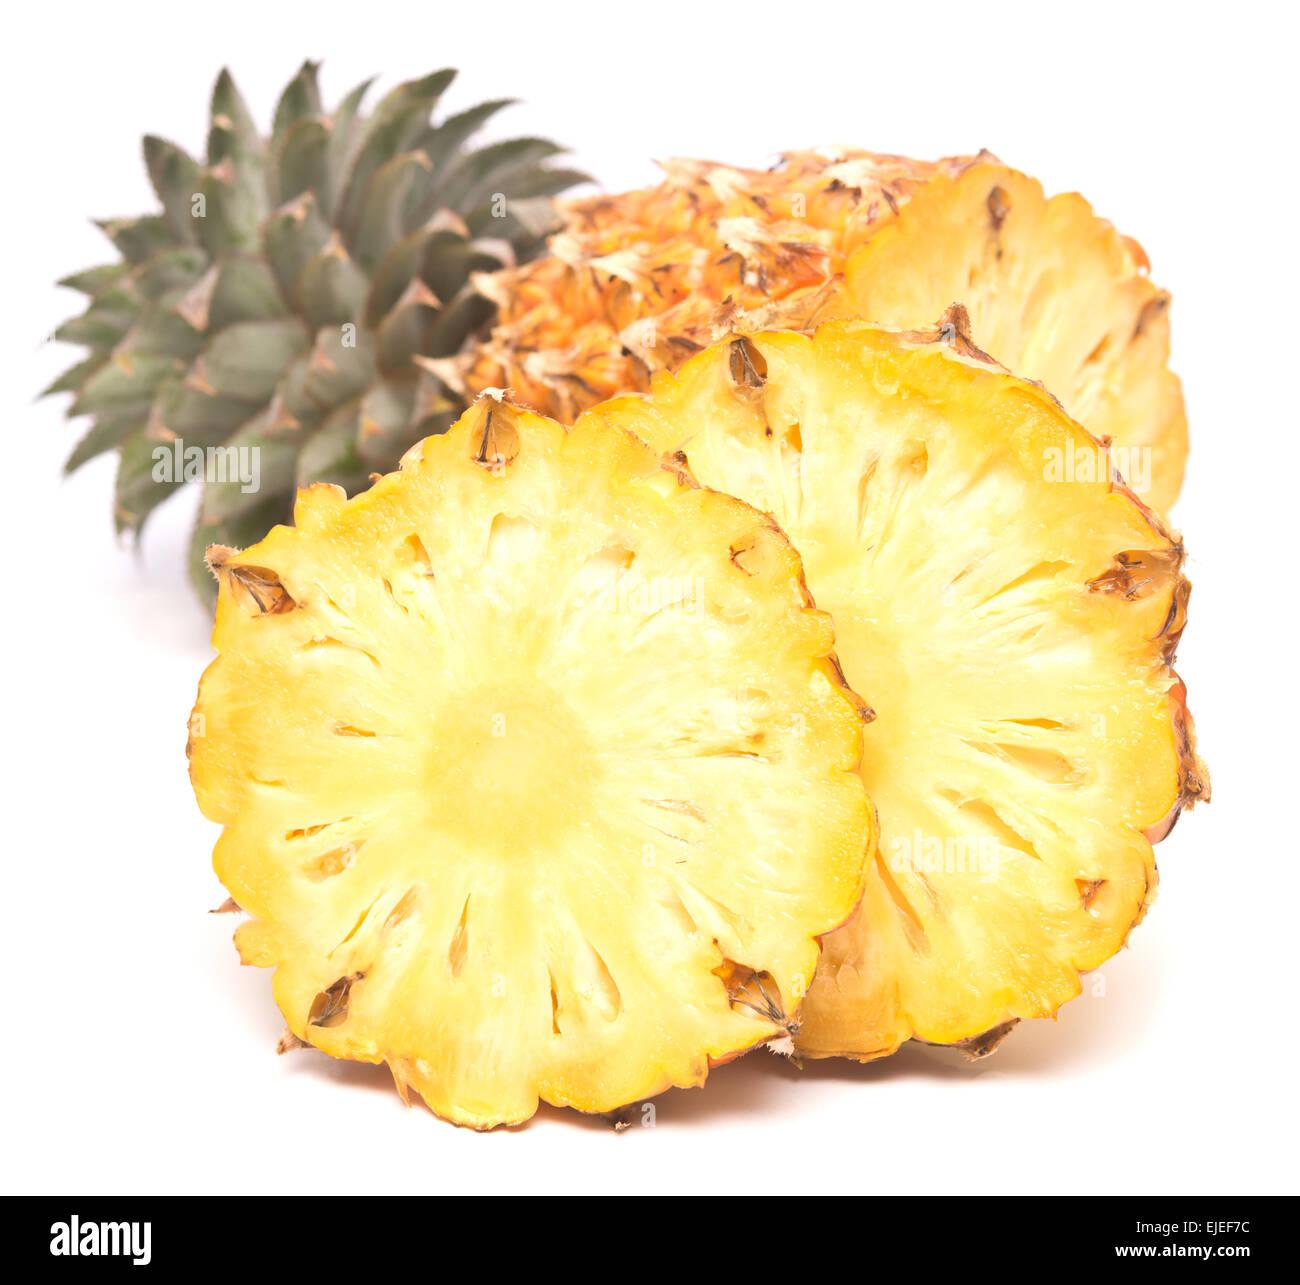 ripe juicy pineapple isolated on white background - Stock Image